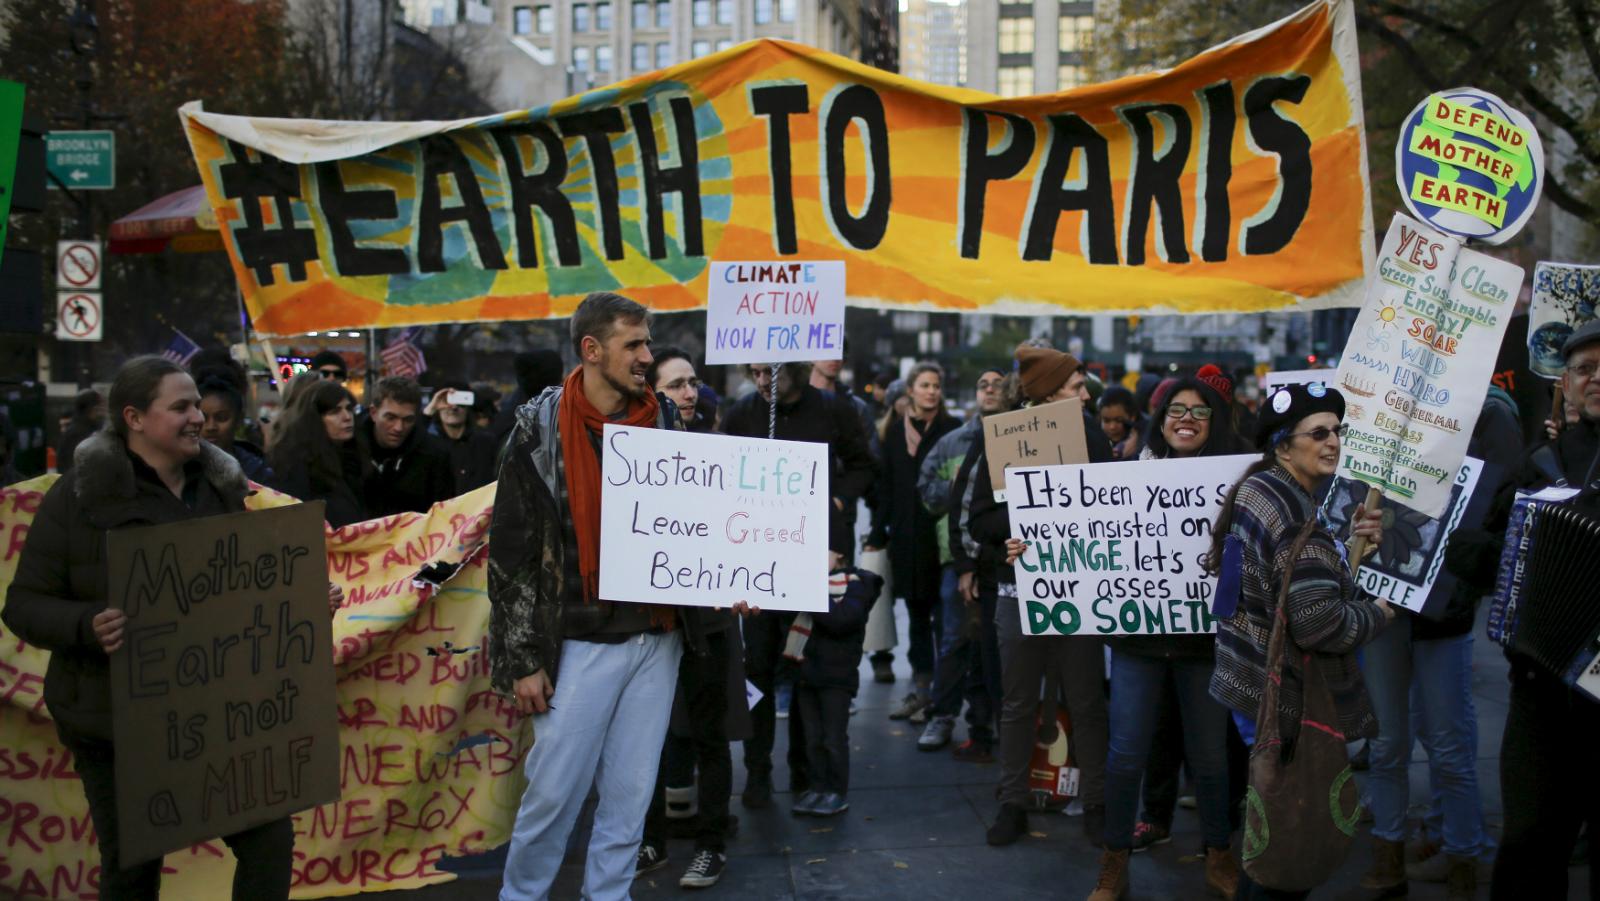 Paris-Climate Change-India-USA-Russia-China